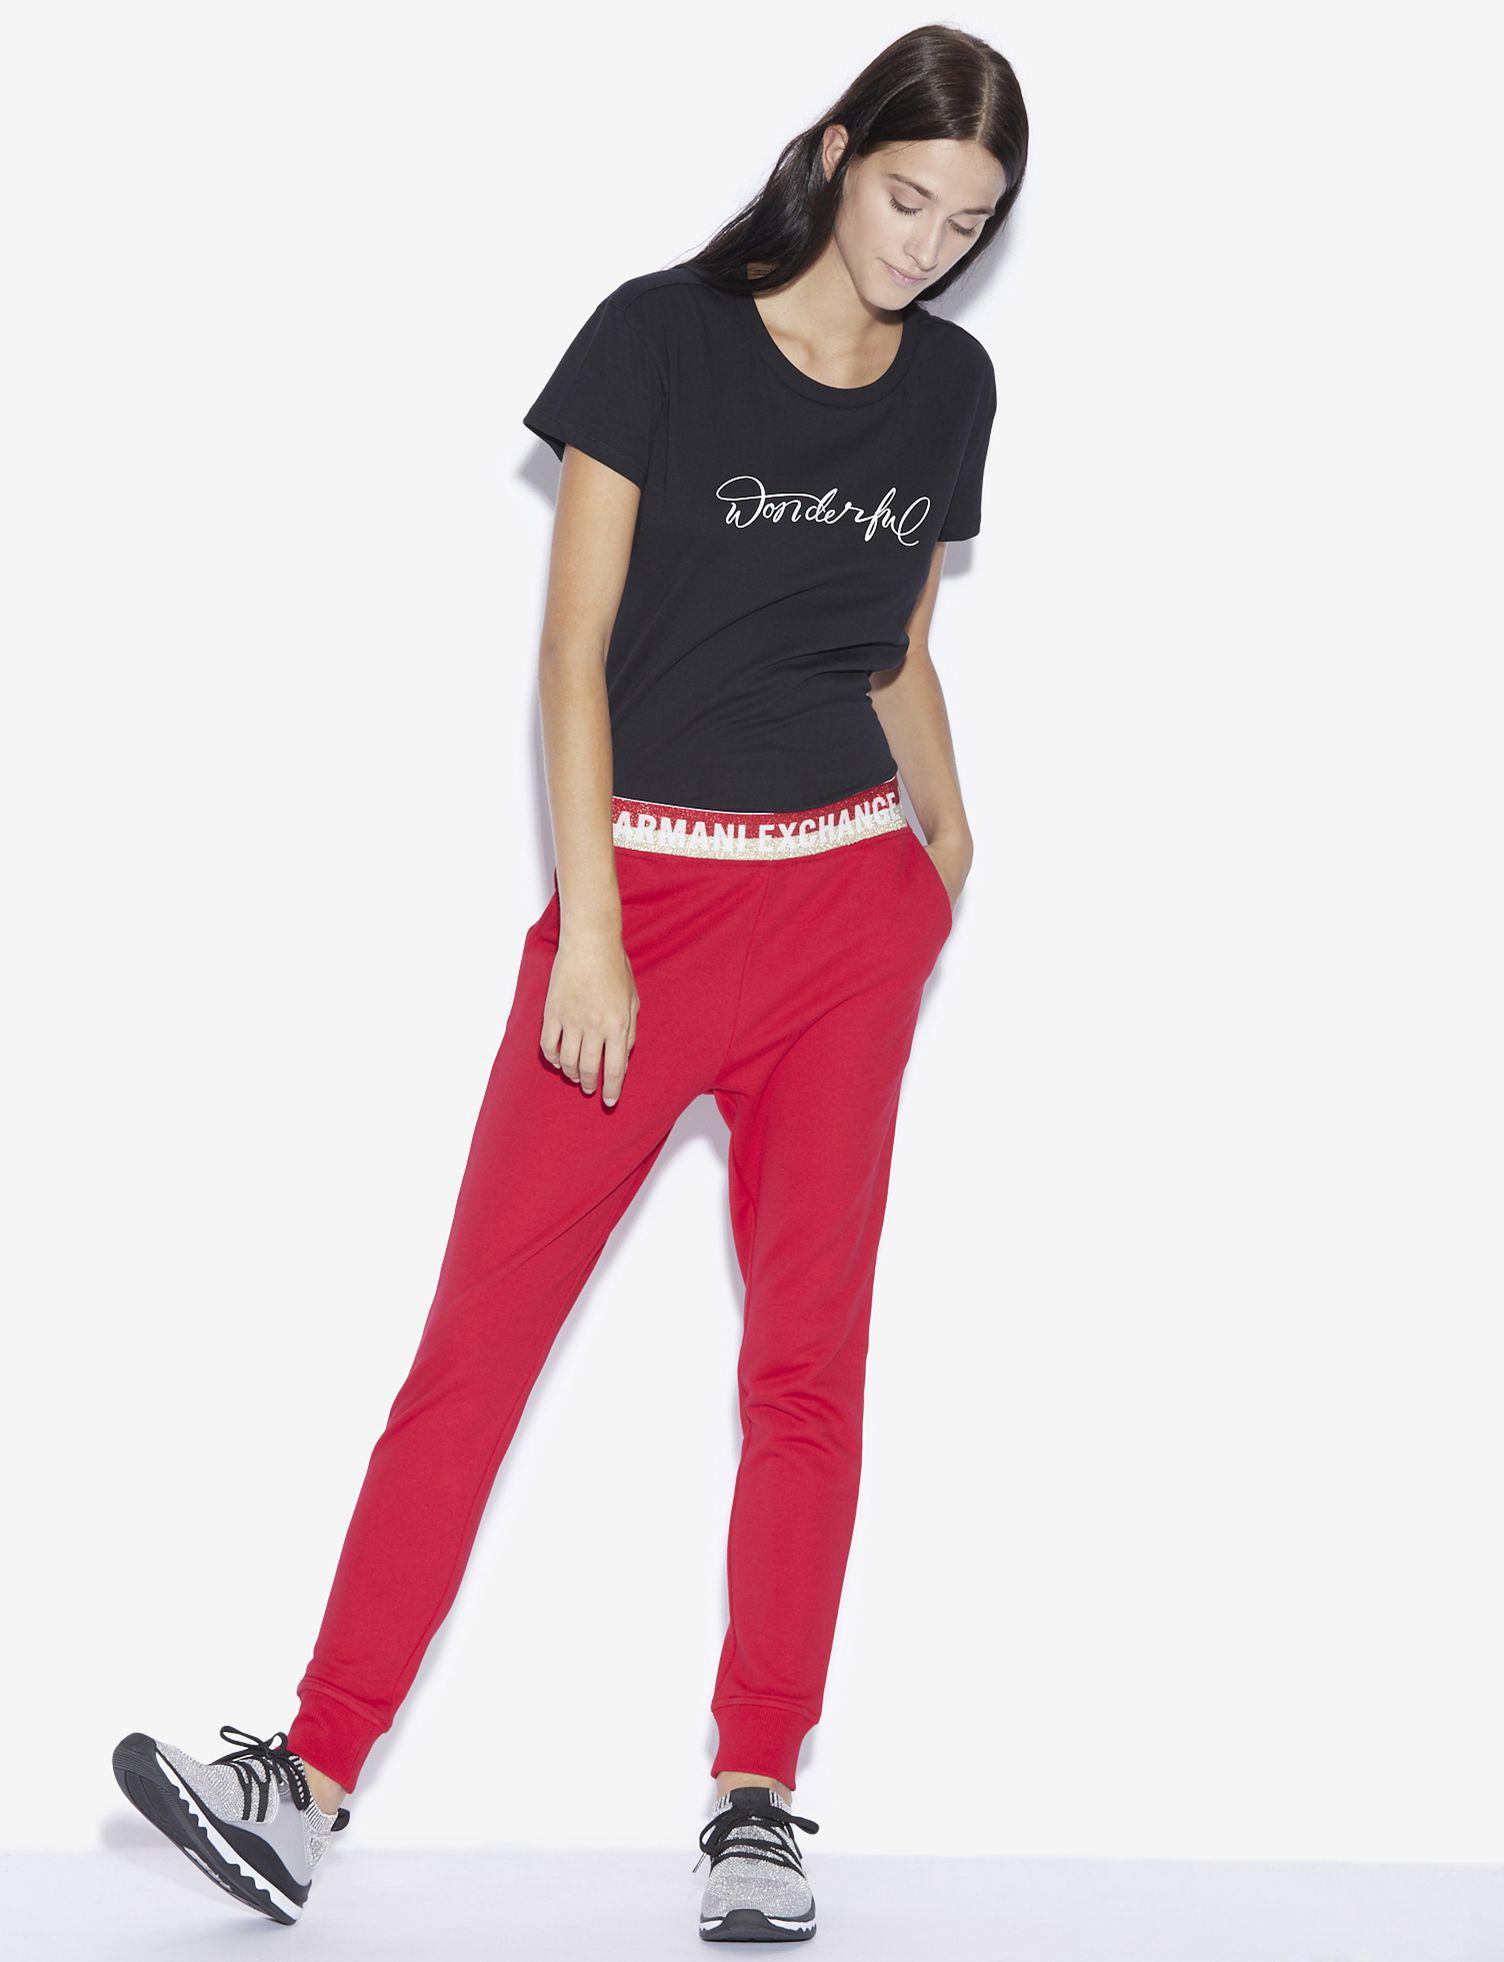 Active Top & Bottom Sets DKNY Girls Glitter-Taped 2-Piece Sweatsuit Pants  Set Clothing, Shoes & Jewelry belasidevelopers.co.ke